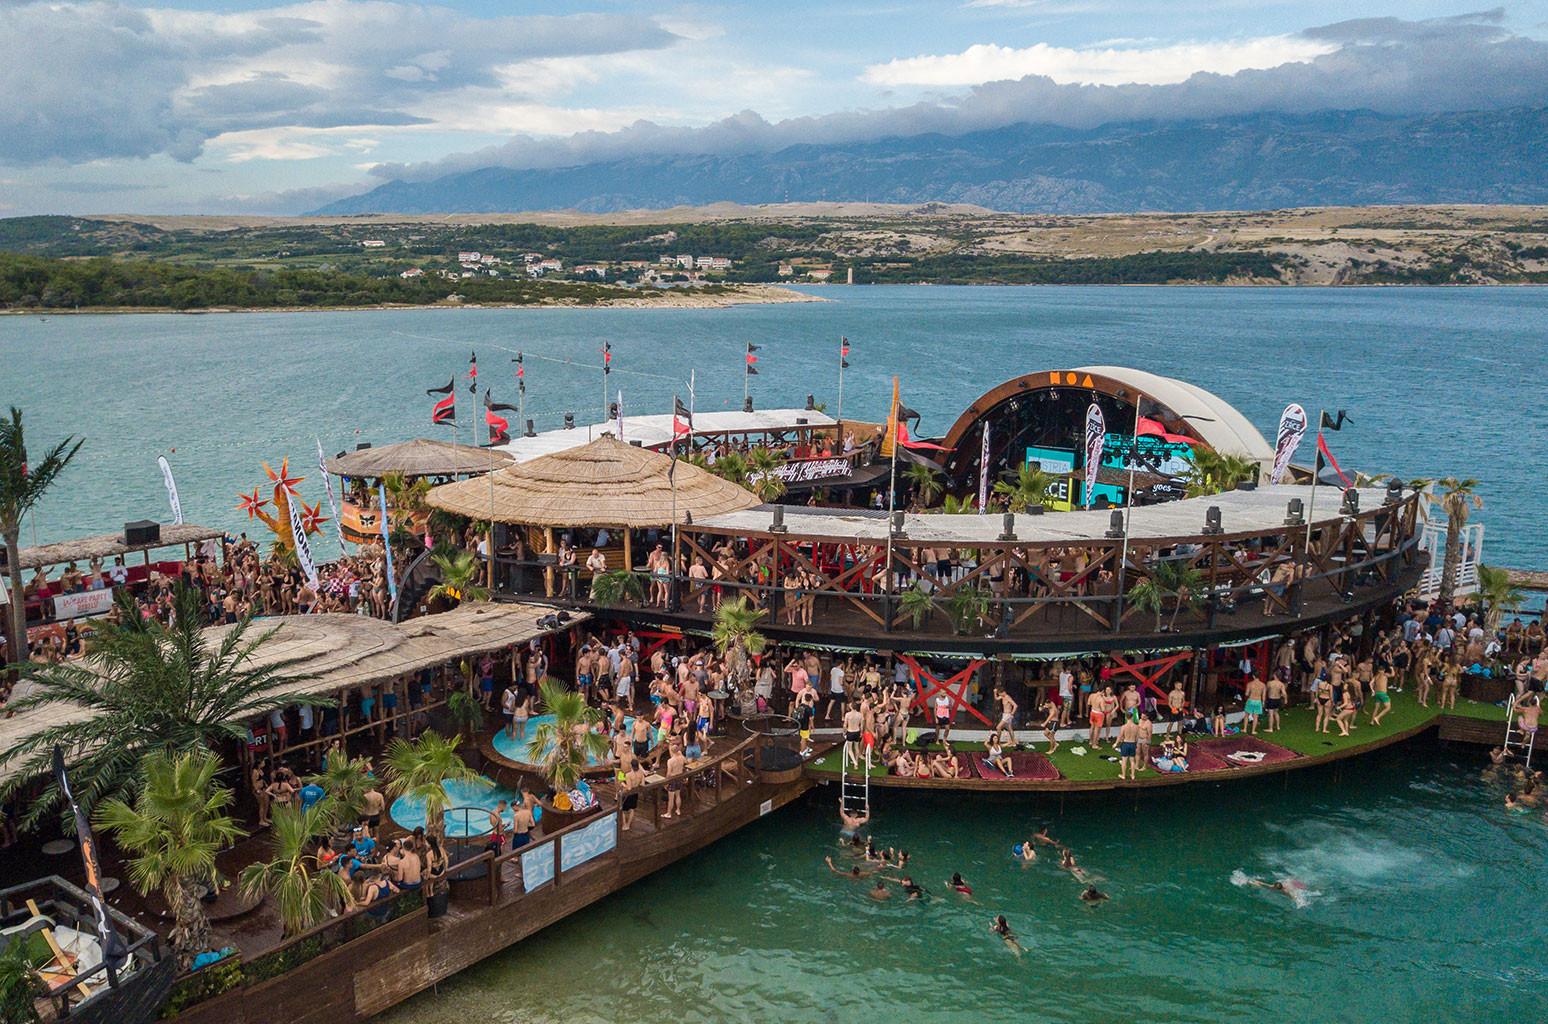 Croatia NOA Beach Club Awake Dropzone Festival